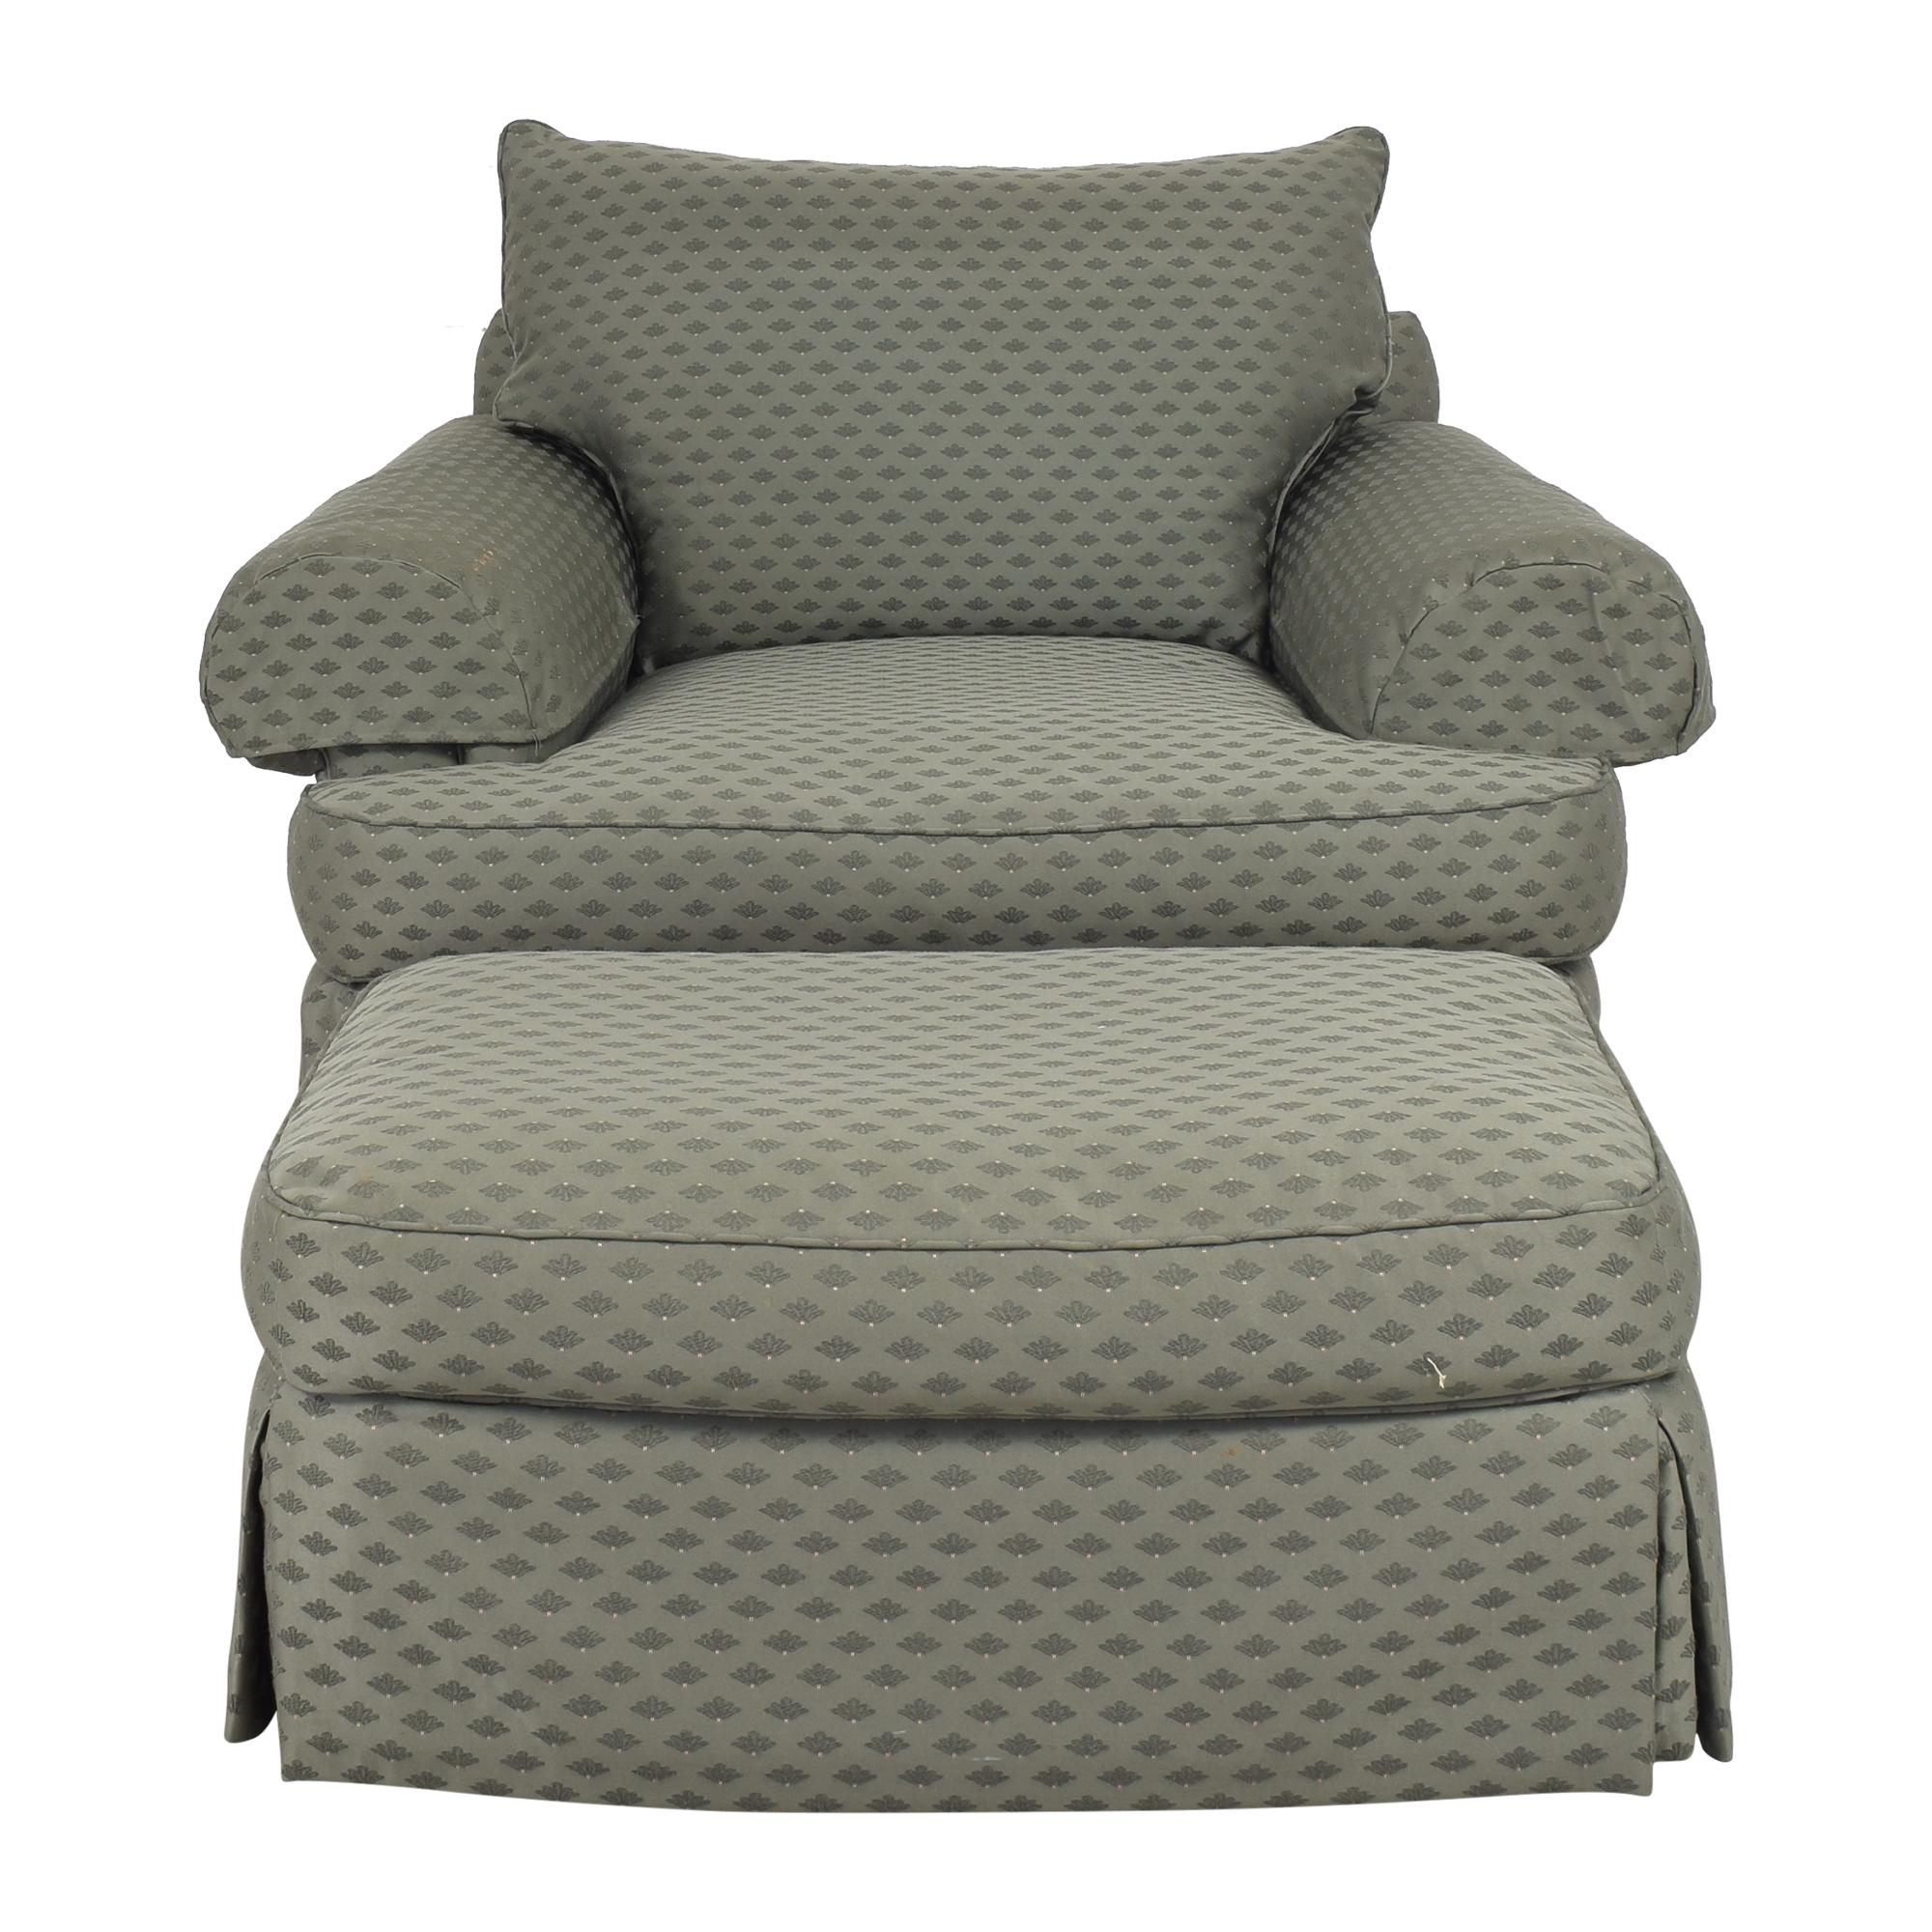 Thomasville Thomasville Skirted Chair and Ottoman